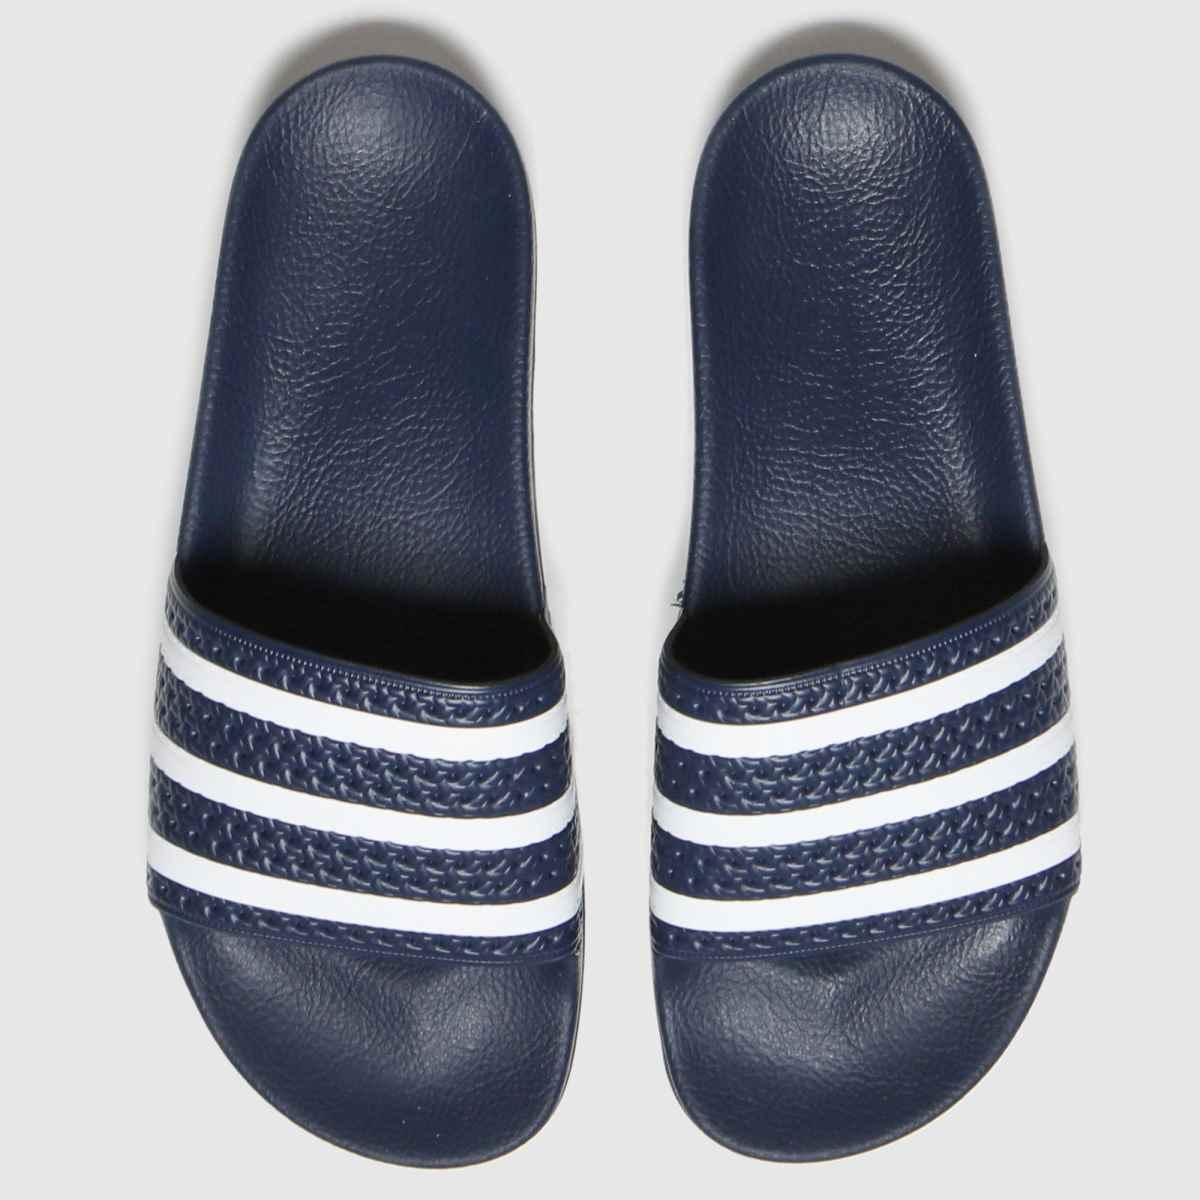 Adidas Navy & White Adilette Sandals